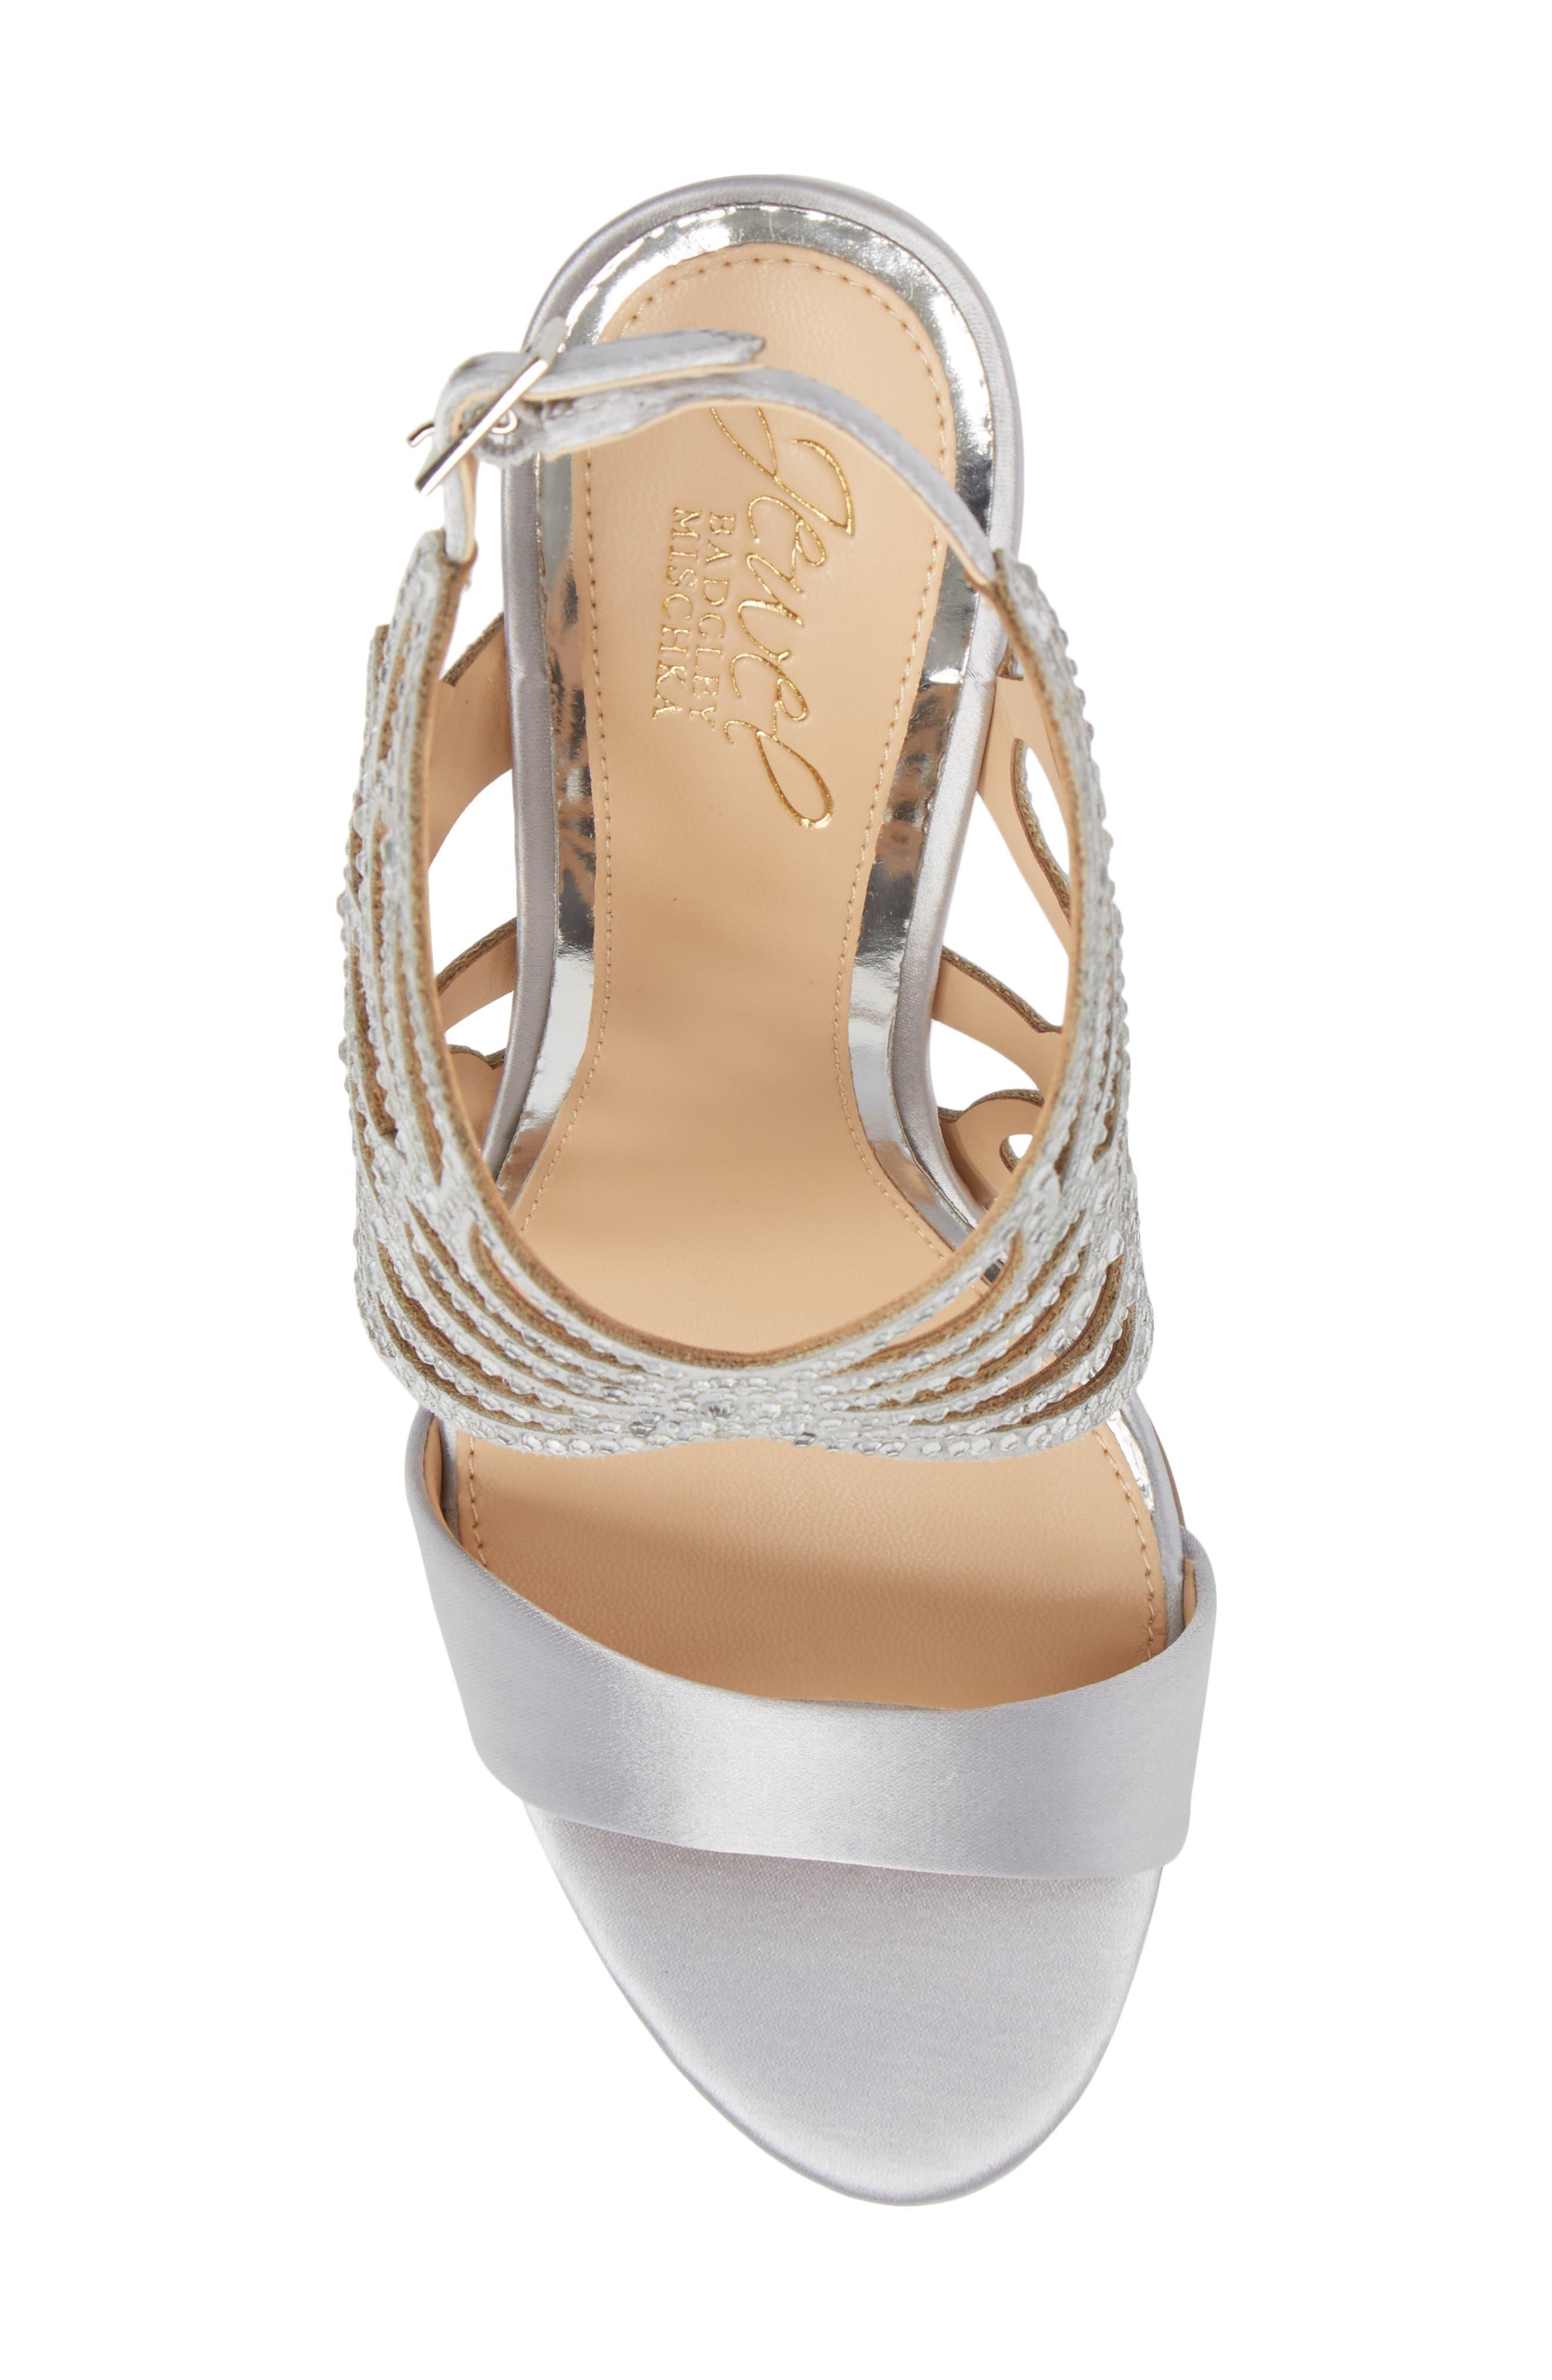 Taresa Crystal Embellished Butterfly Sandal,                             Alternate thumbnail 18, color,